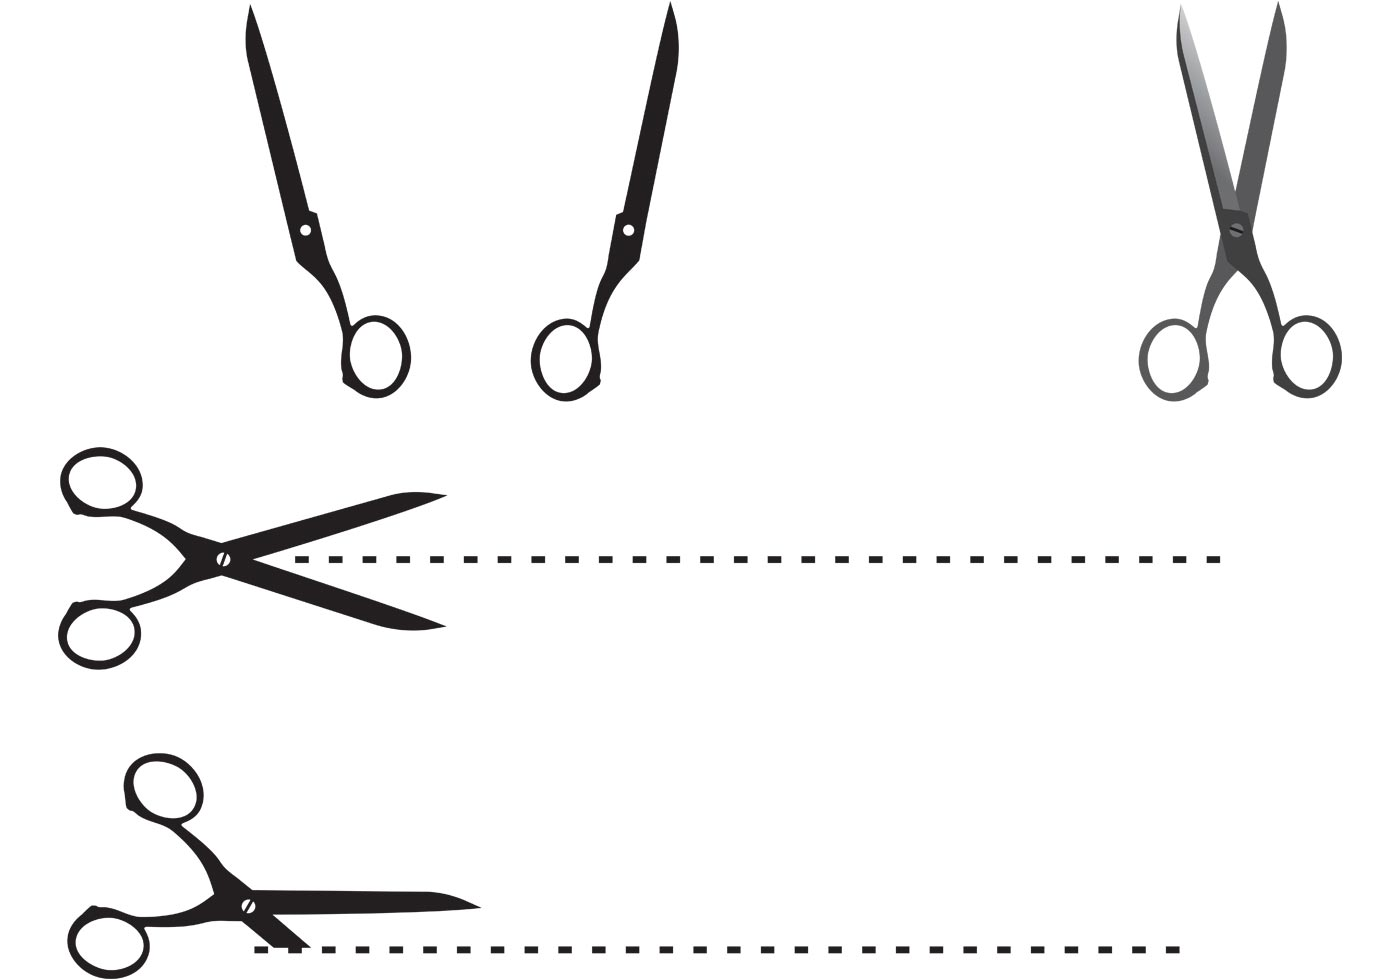 scissors free vector art 418 free downloads rh vecteezy com barber scissor vector scissor vector image